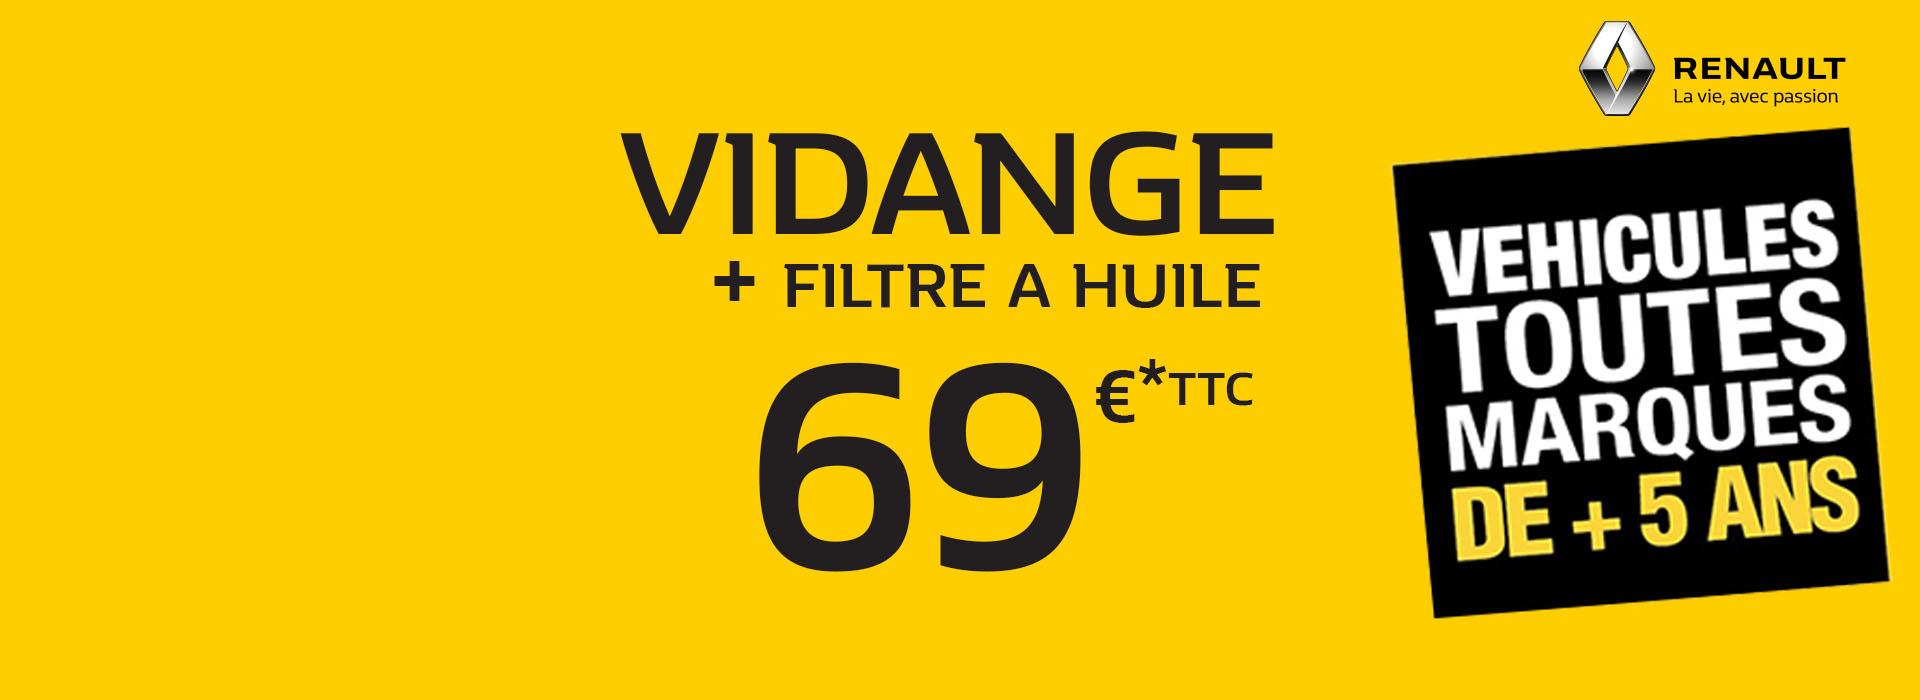 Renault marignane concessionnaire garage bouches du for Vidange garage renault